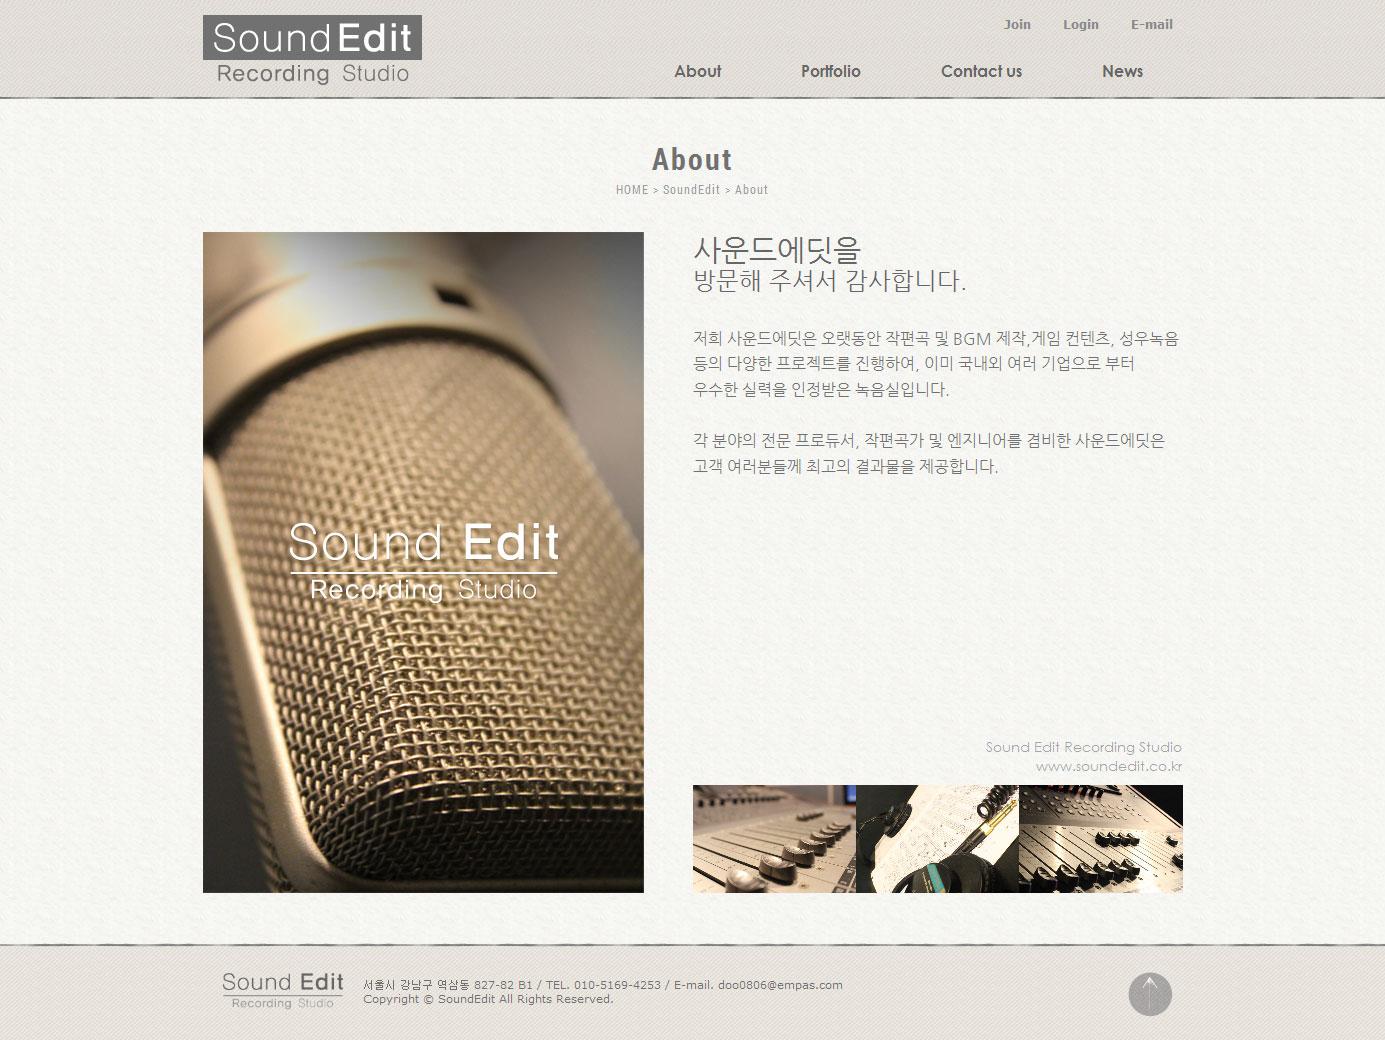 Sound Edit 반응형 홈페이지 제작